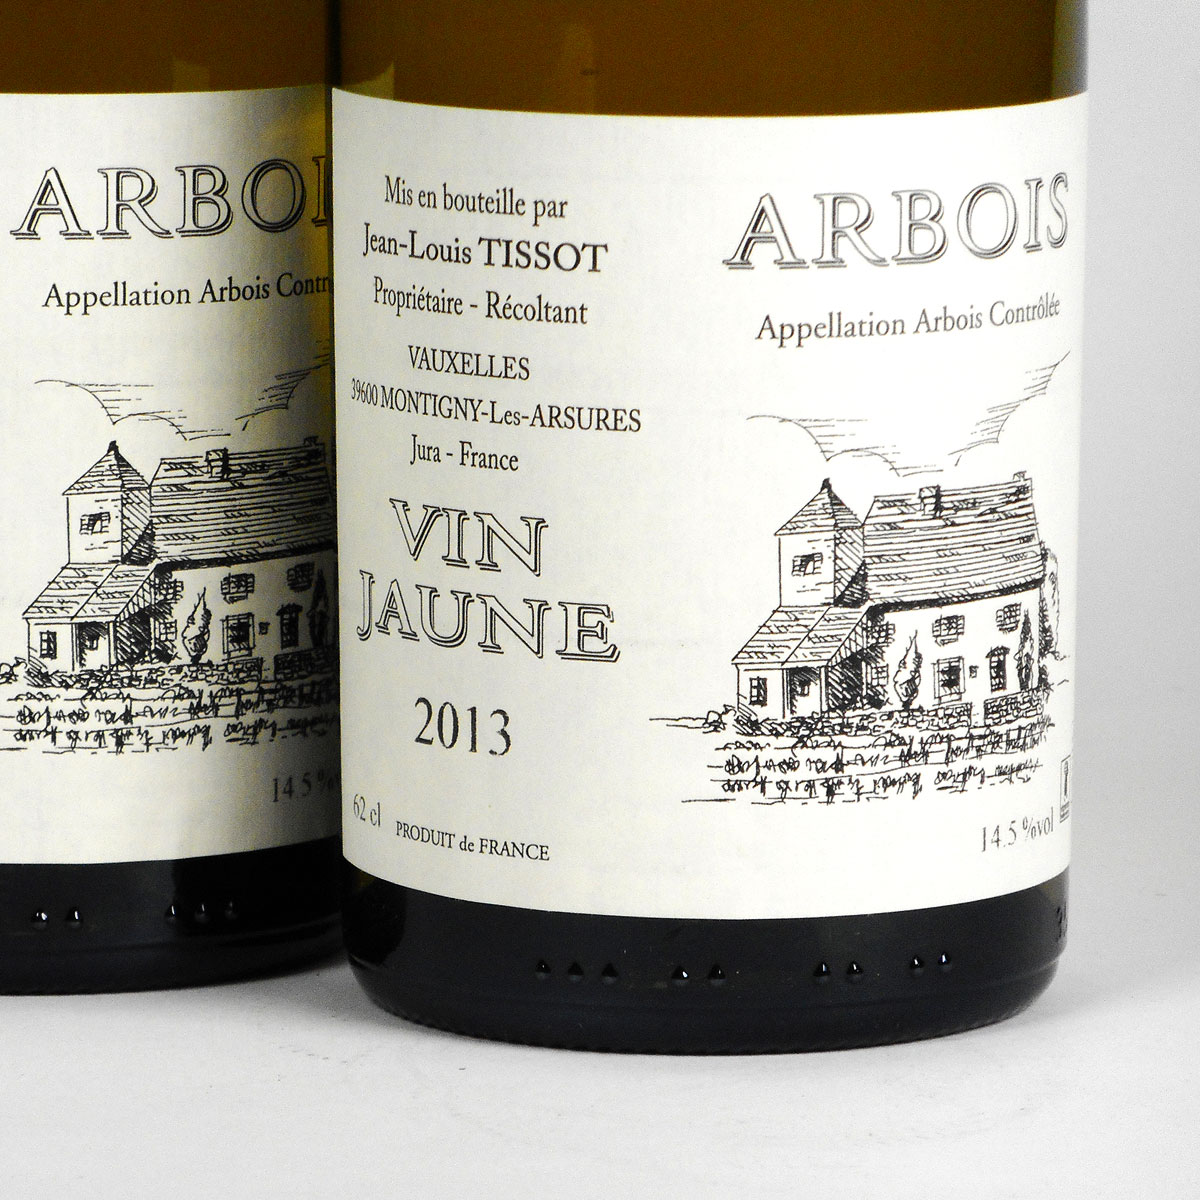 Jura Arbois: Vin Jaune Domaine Jean-Louis Tissot 2013